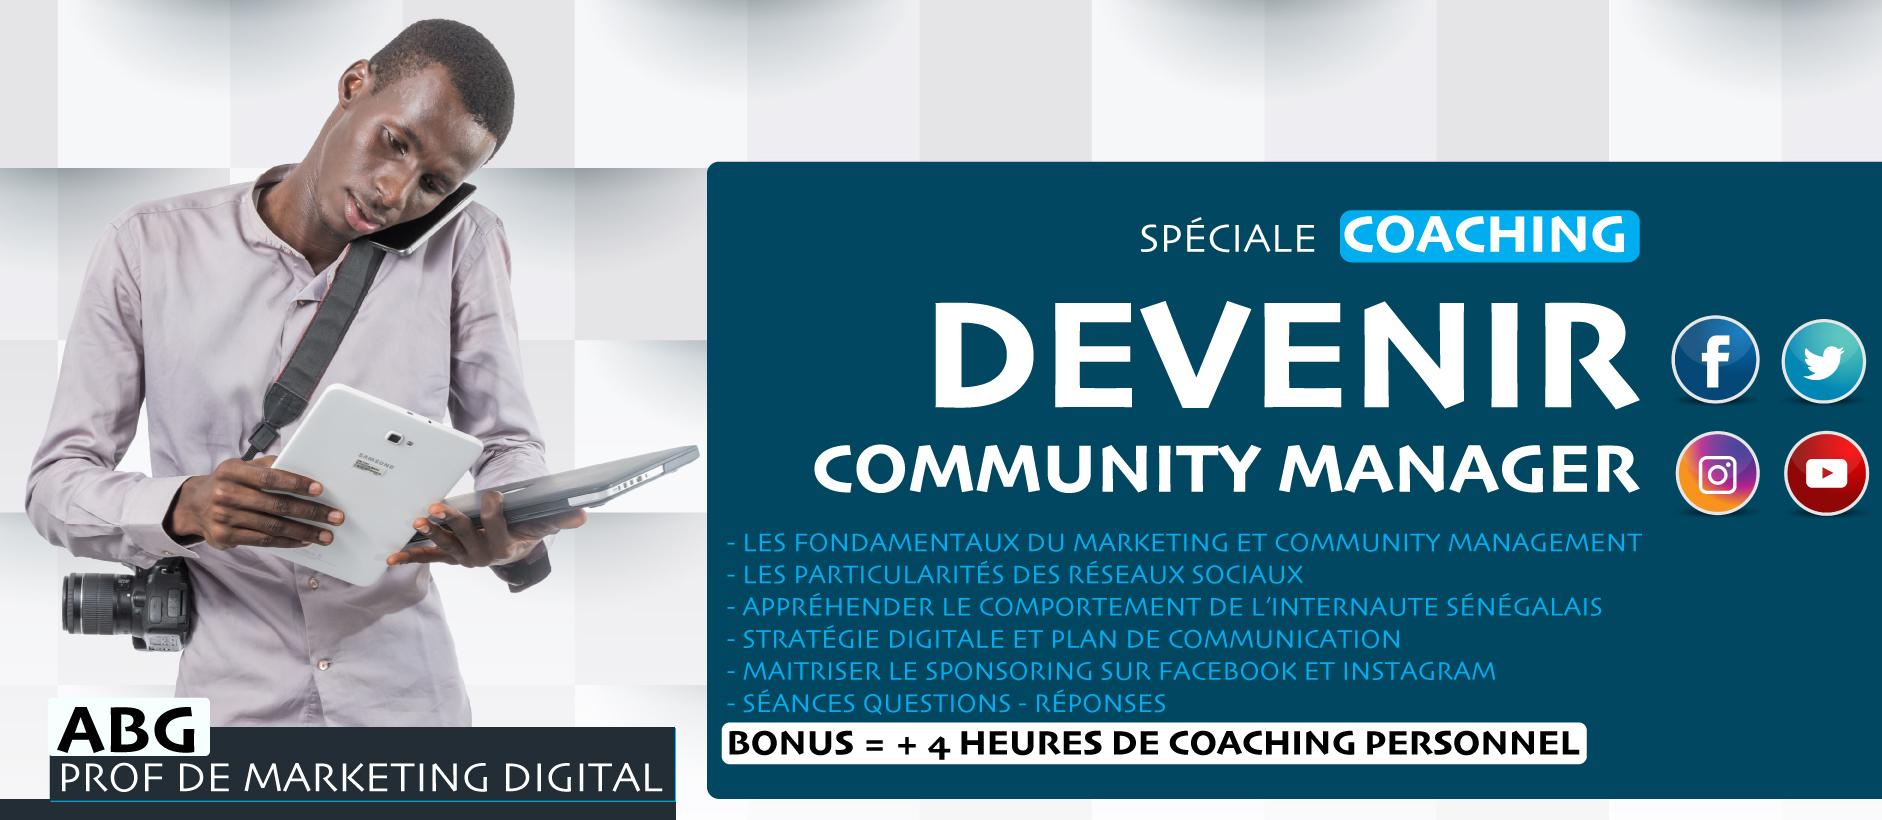 Formation devenir community manager